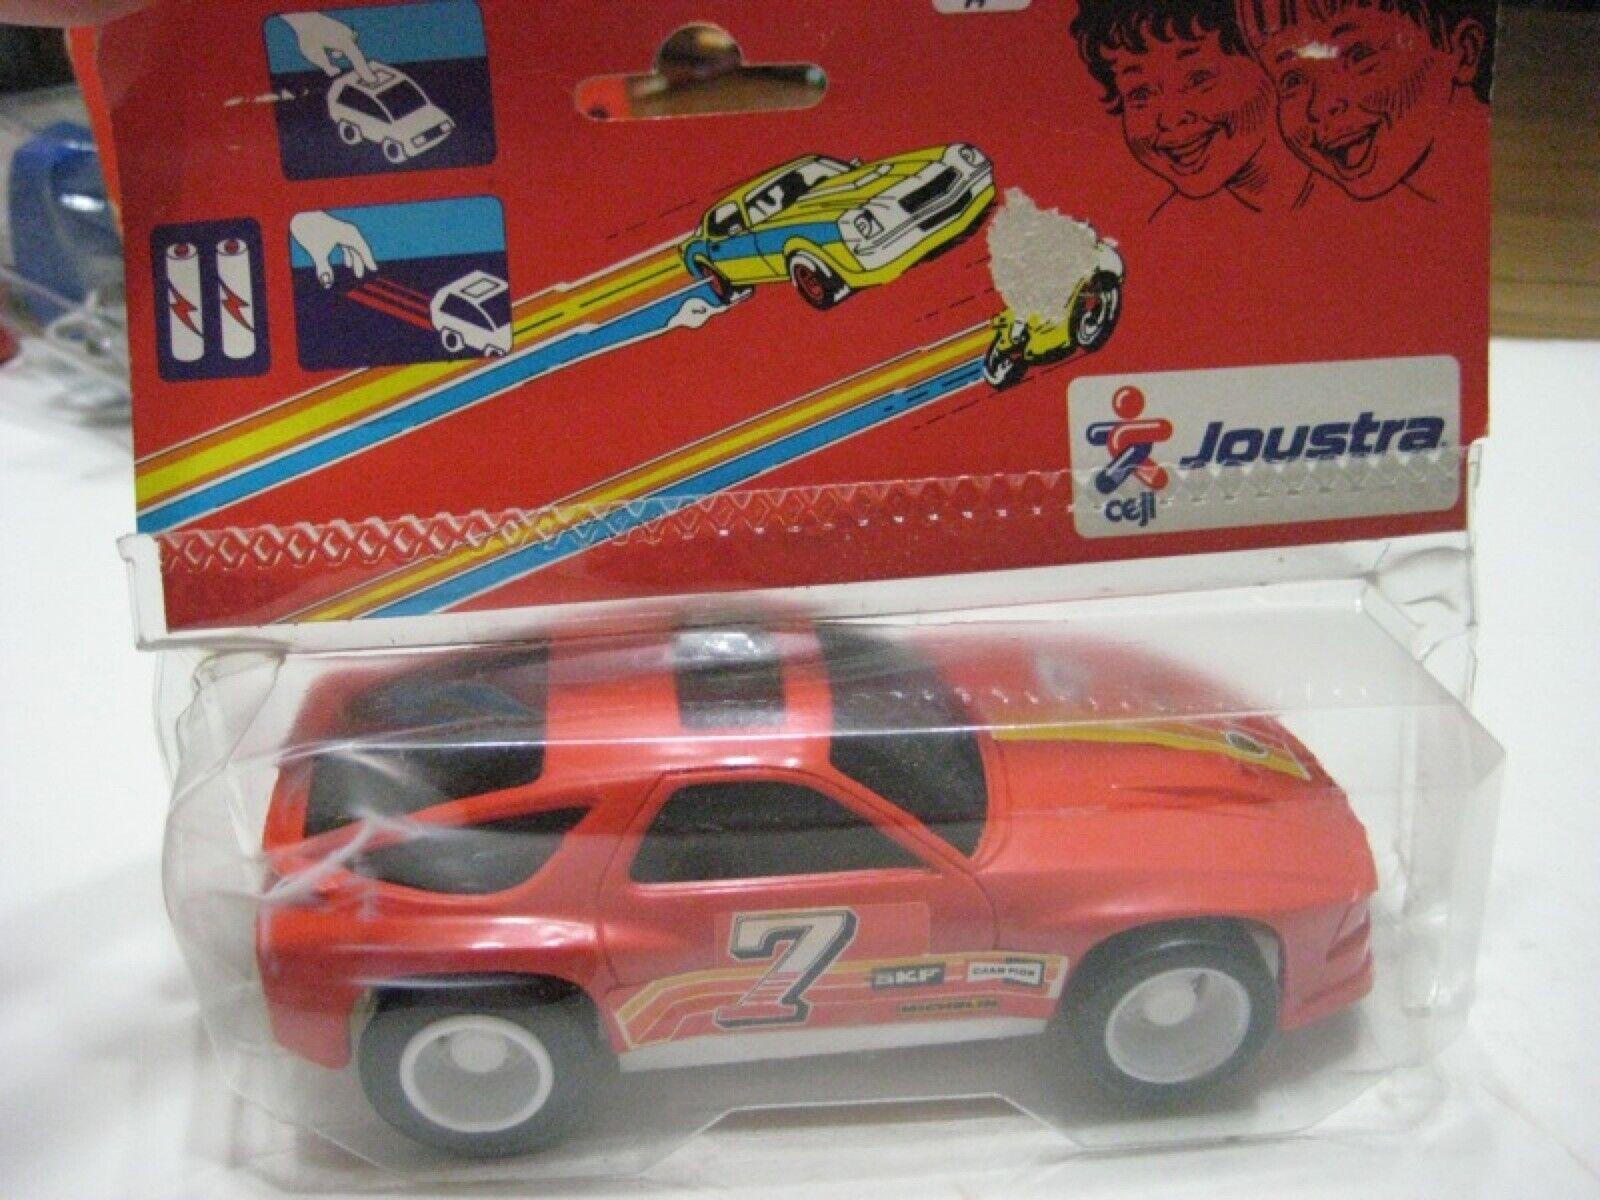 Joustra (France) Tangerine Porsche 944 Rally 1 27 Plastic Electric Friction NIB